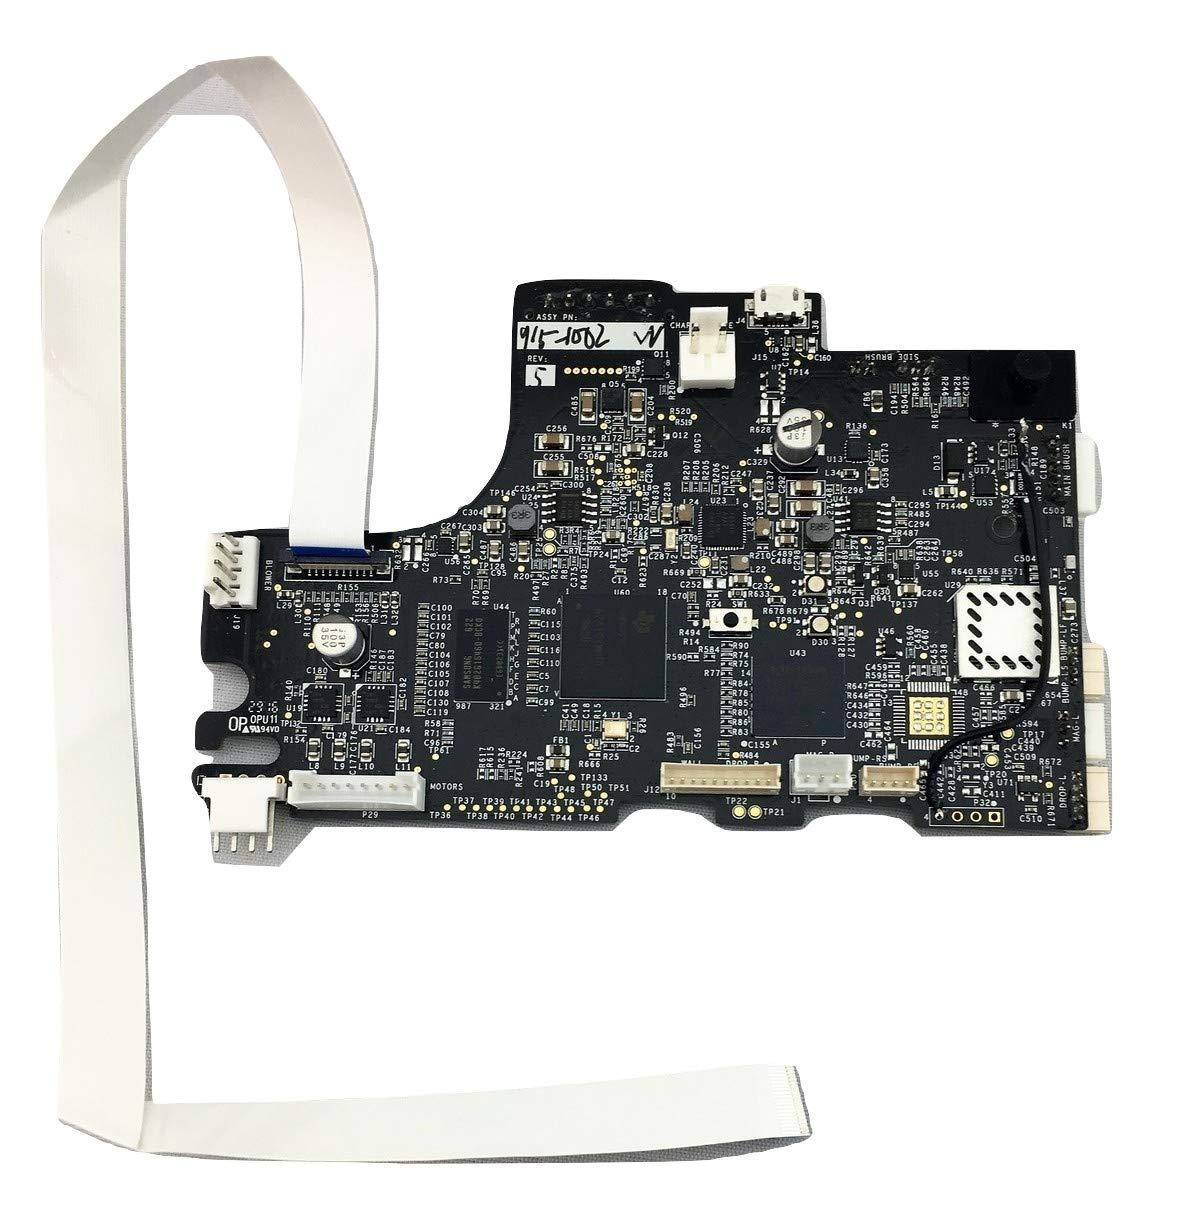 Neato Botvac D3 D4 Connected PCB MCU Motherboard Main Board WiFi RF